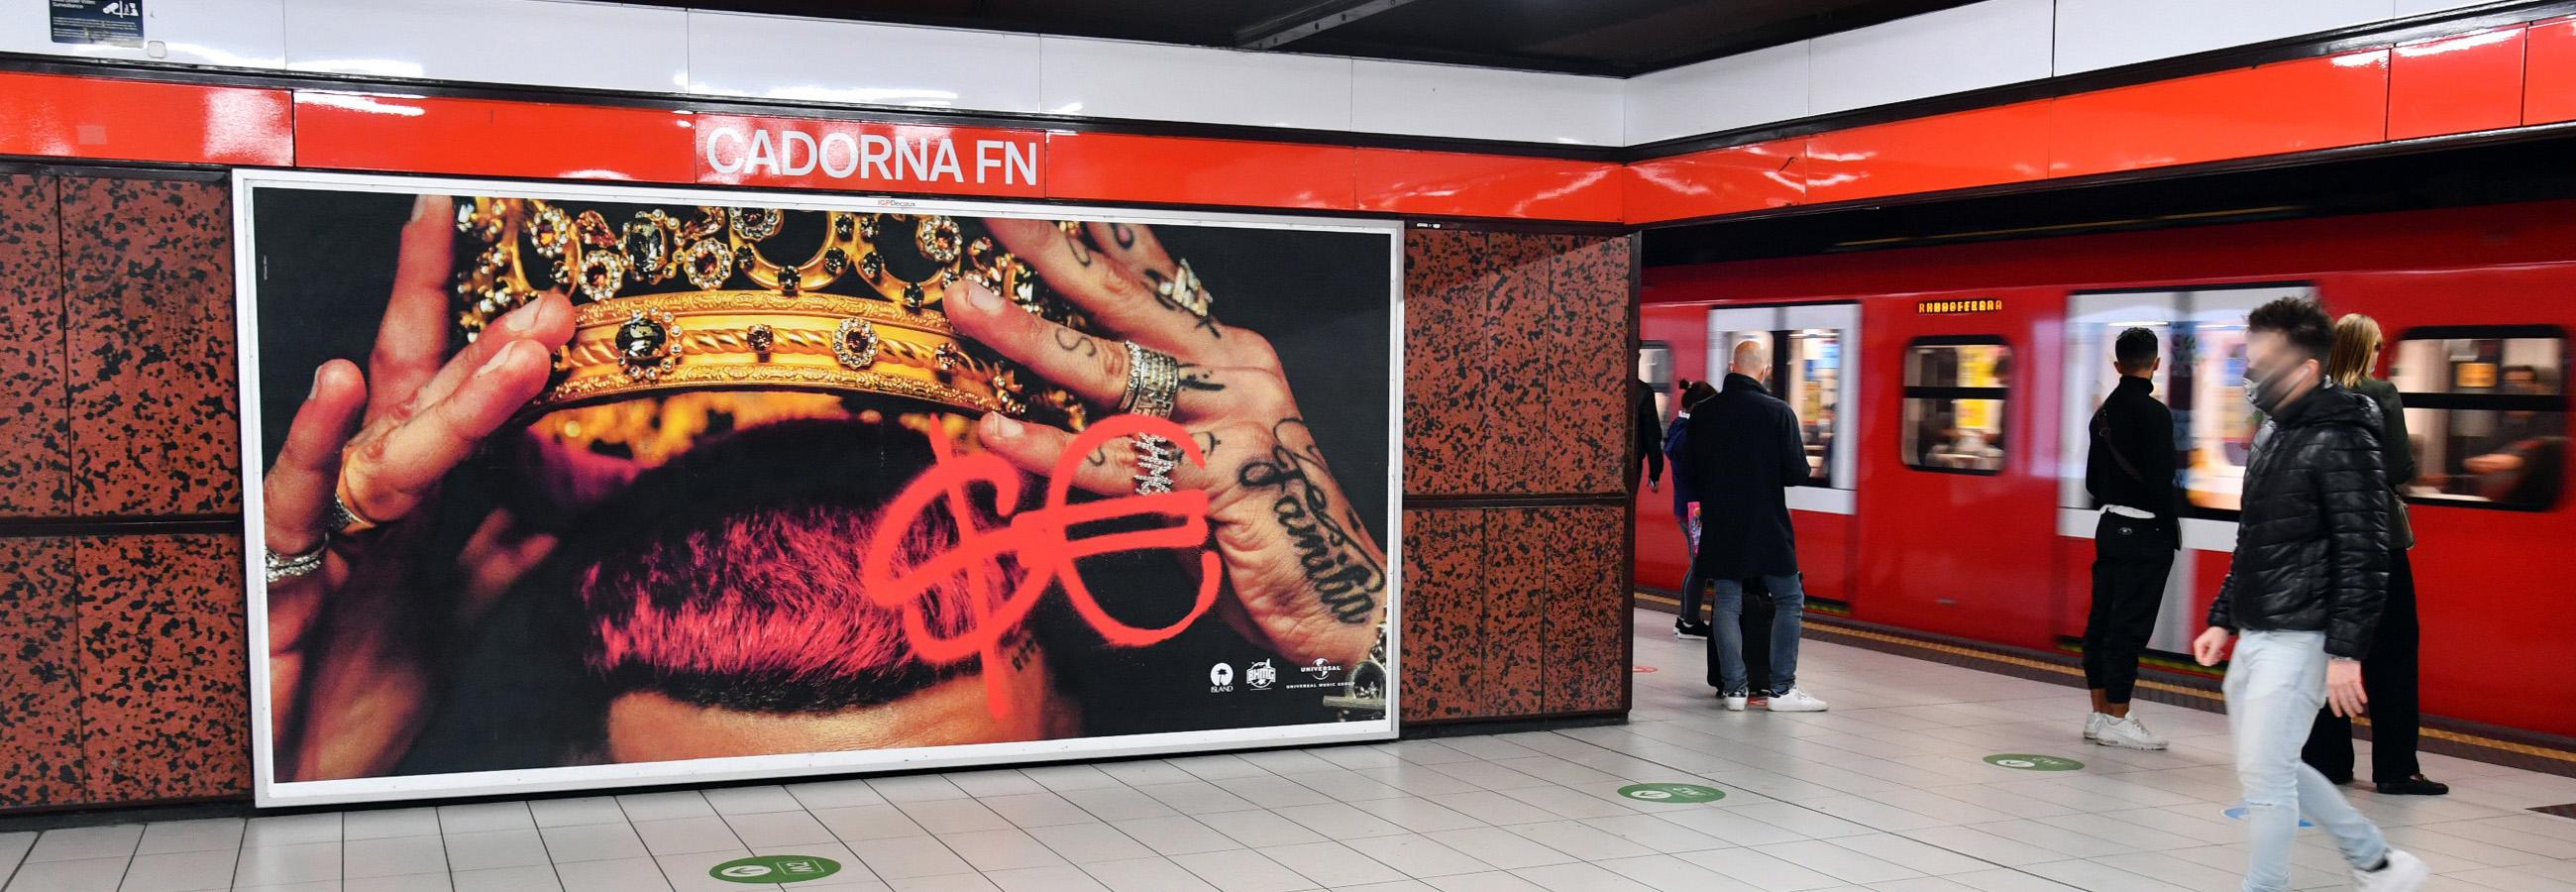 Circuito Maxi metropolitana Sfera Ebbasta IGPDecaux Milano